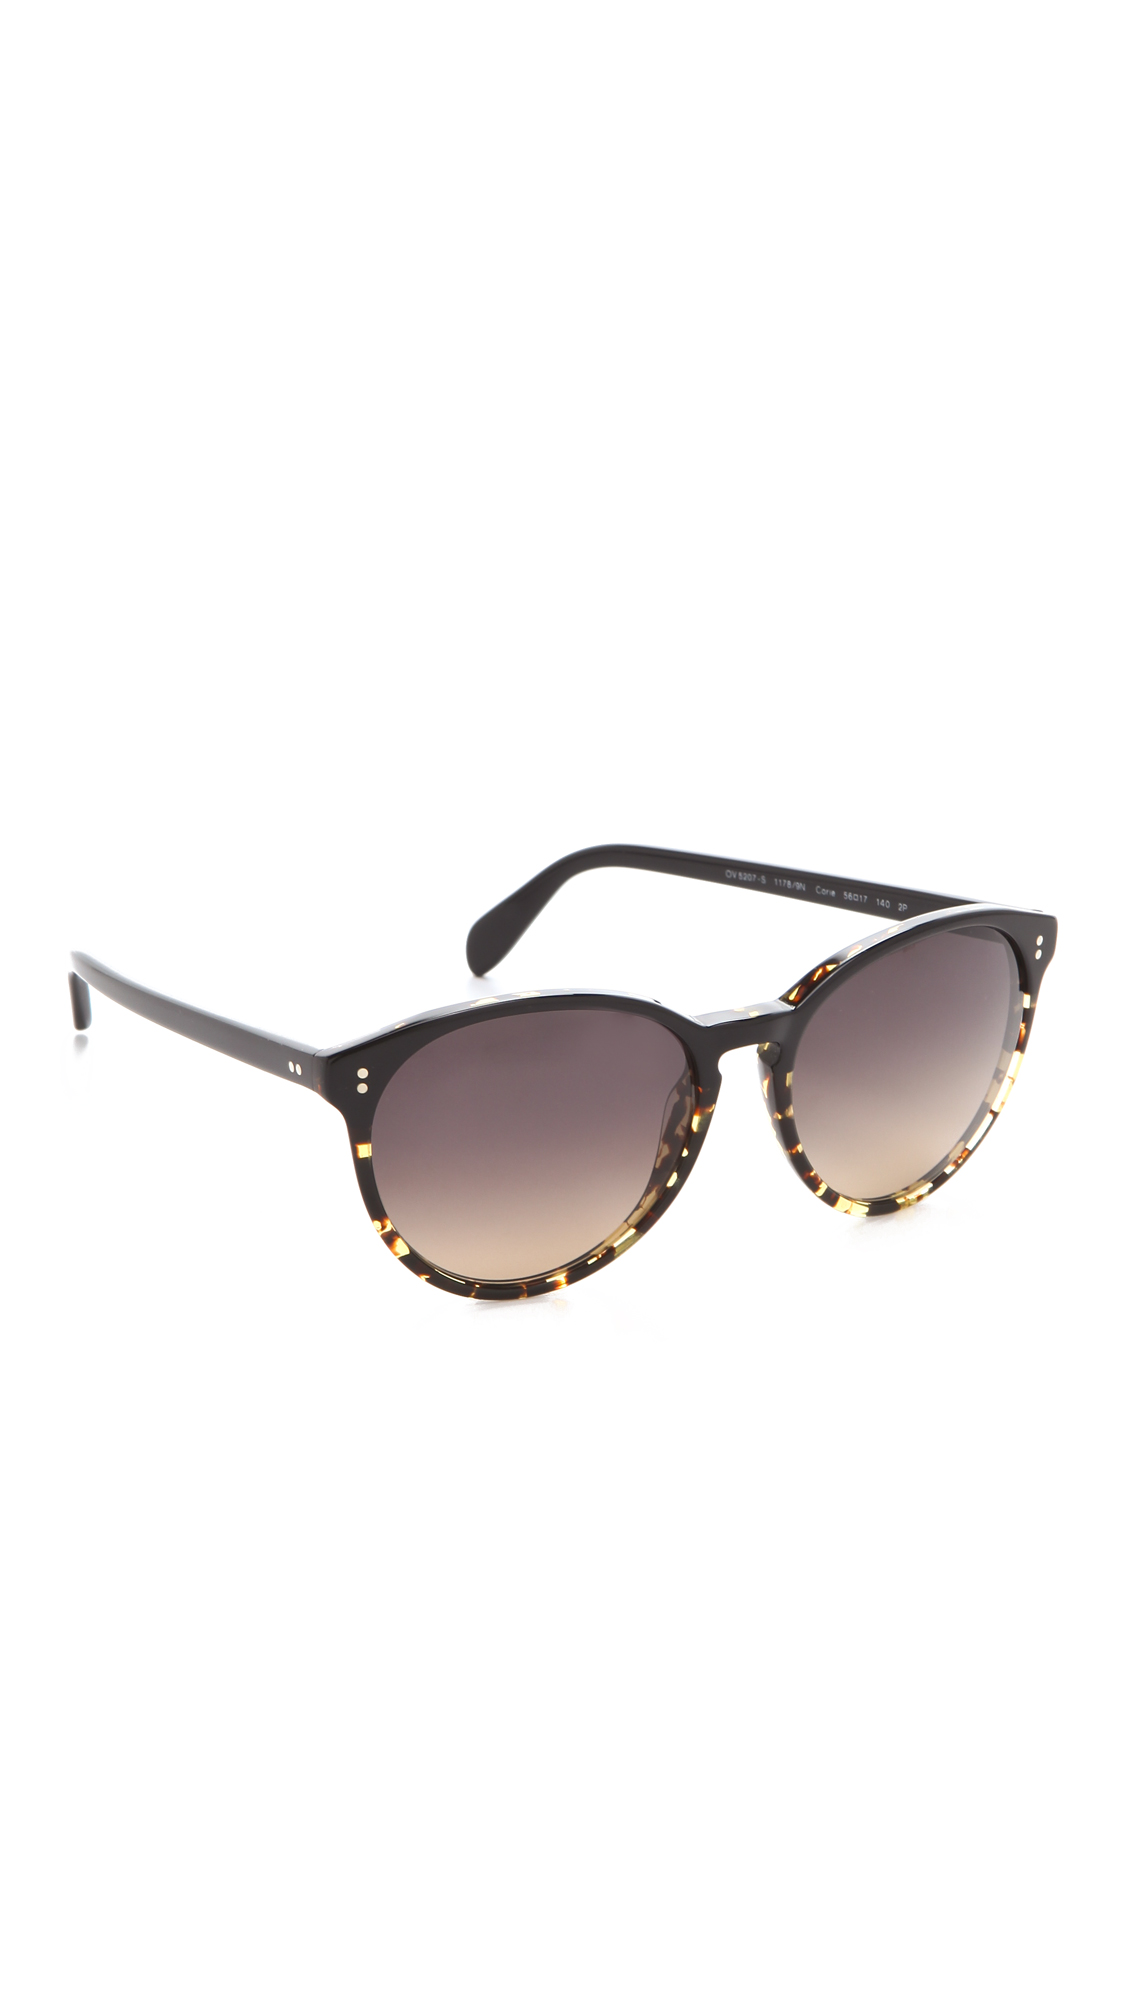 9b3df4a986dd oliver-peoples-eyewear-blackdark-tortoise-corie-polarized-sunglasses -product-2-13536786-528153076.jpeg